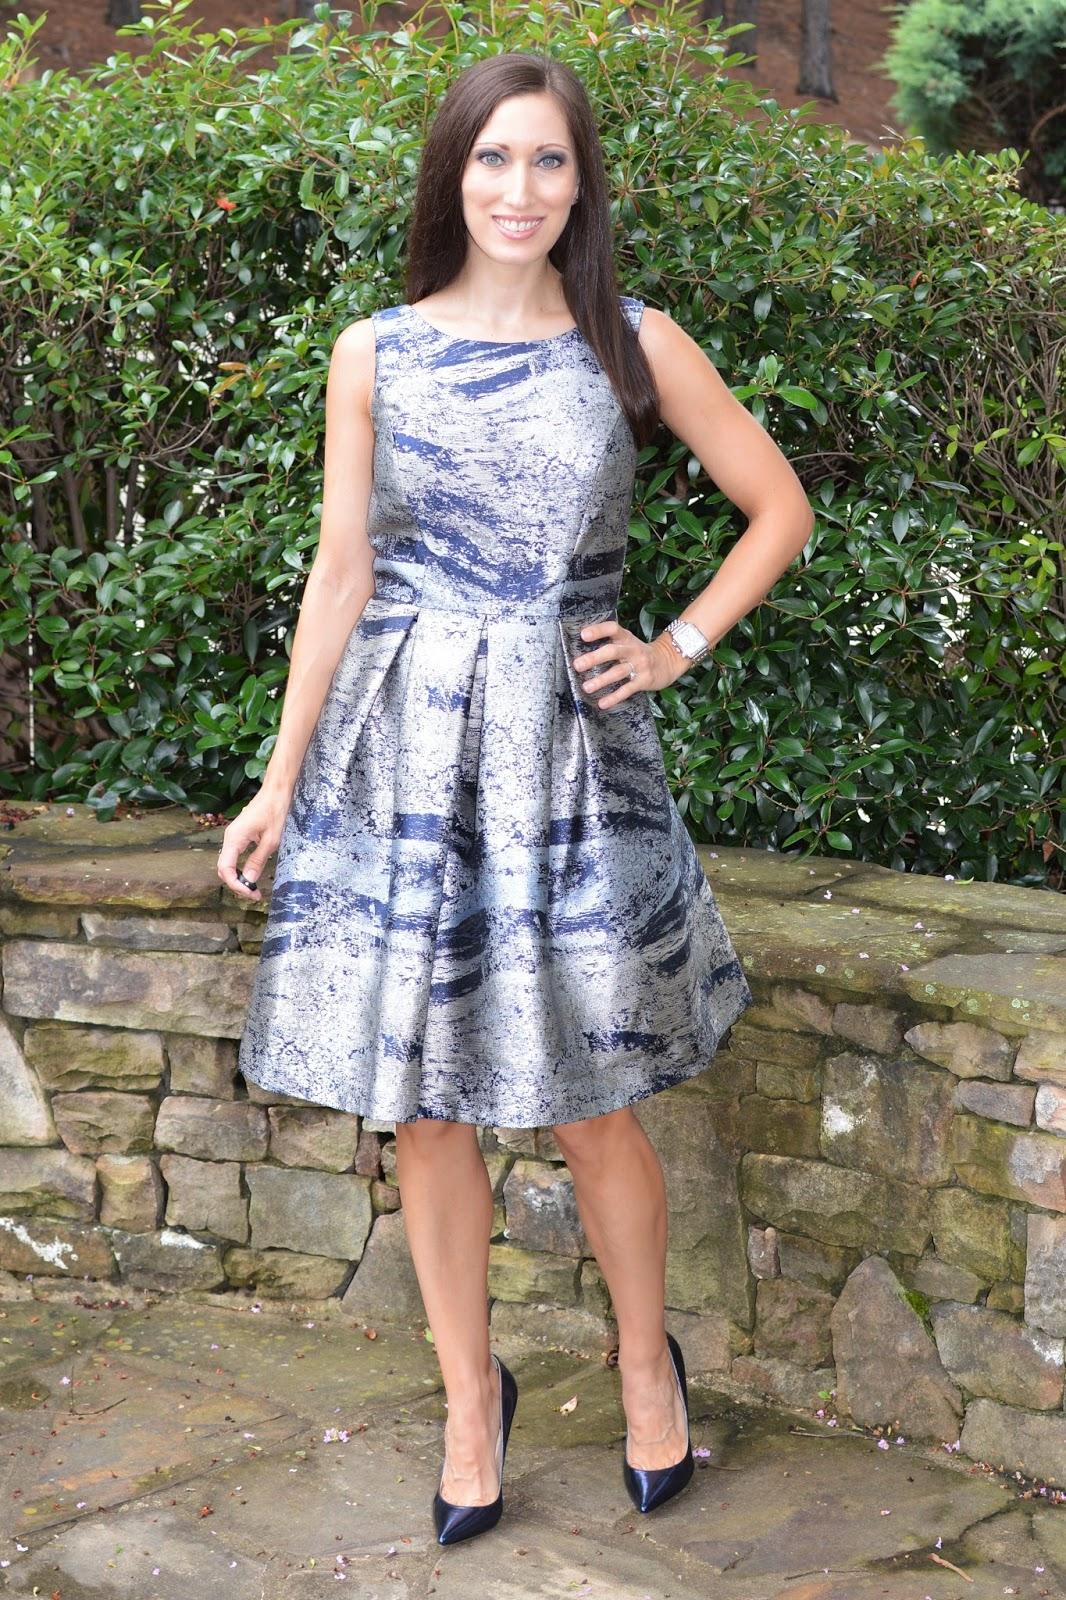 26920b2bc0e Everyday Fashionista - Atlanta Blogger: Summer Rain